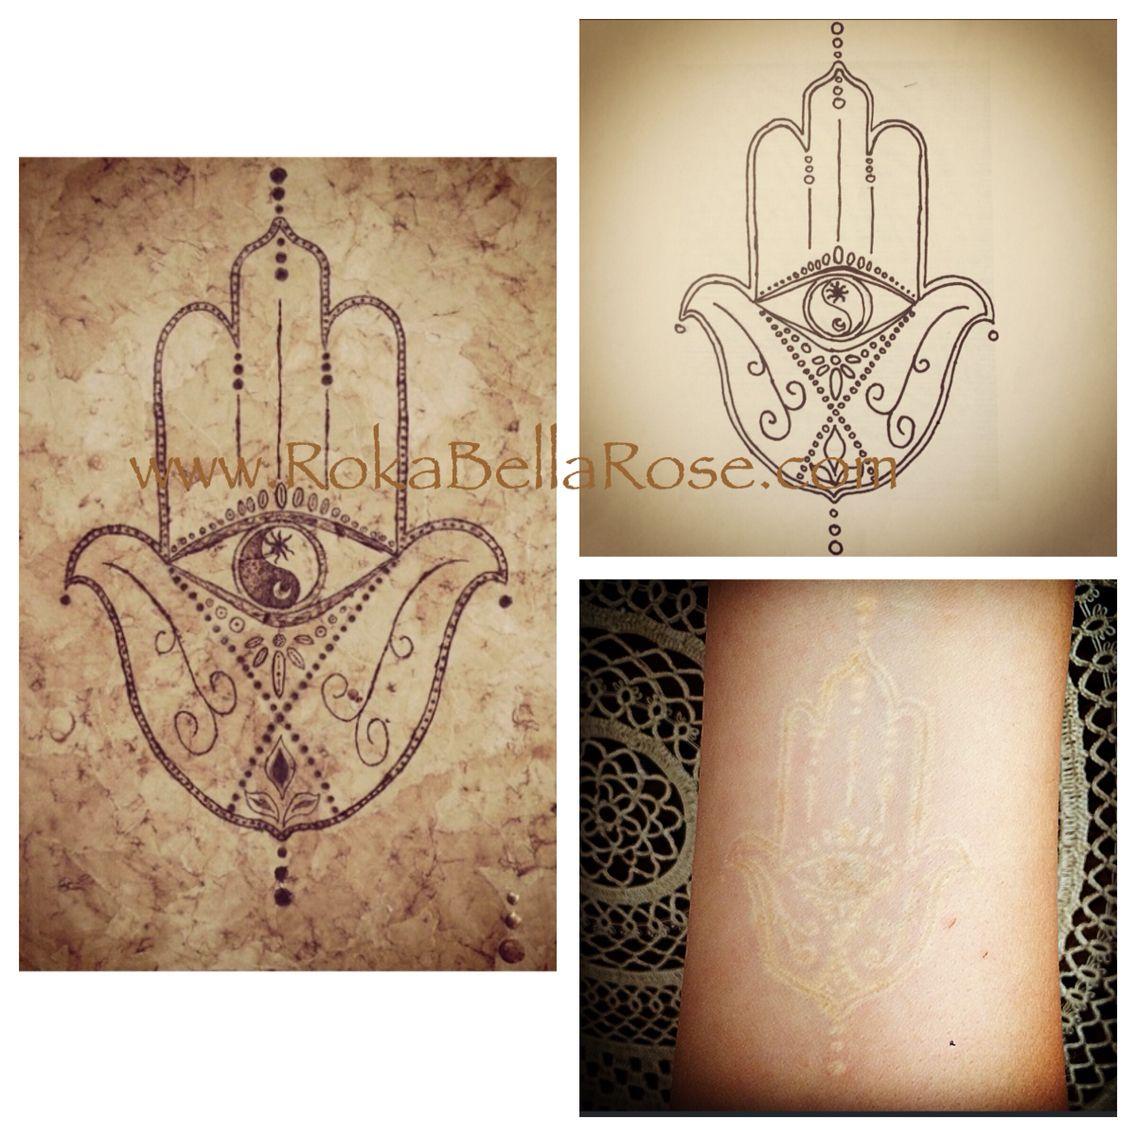 Roka Bella Rose tattoo design templates. ☮☯ Hamsa ☮☯hand